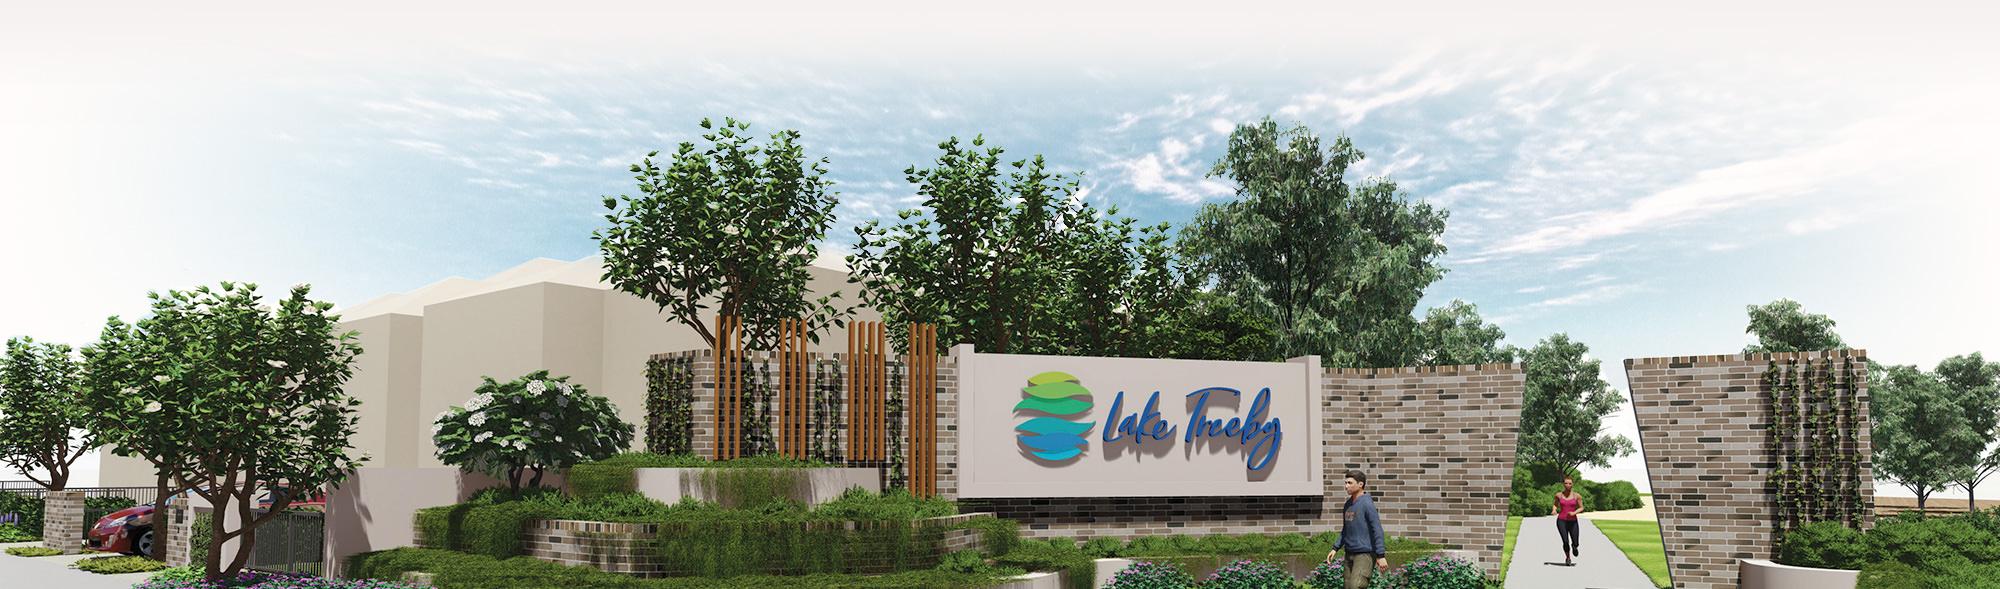 lake-treeby-land-for-sale-vision-render